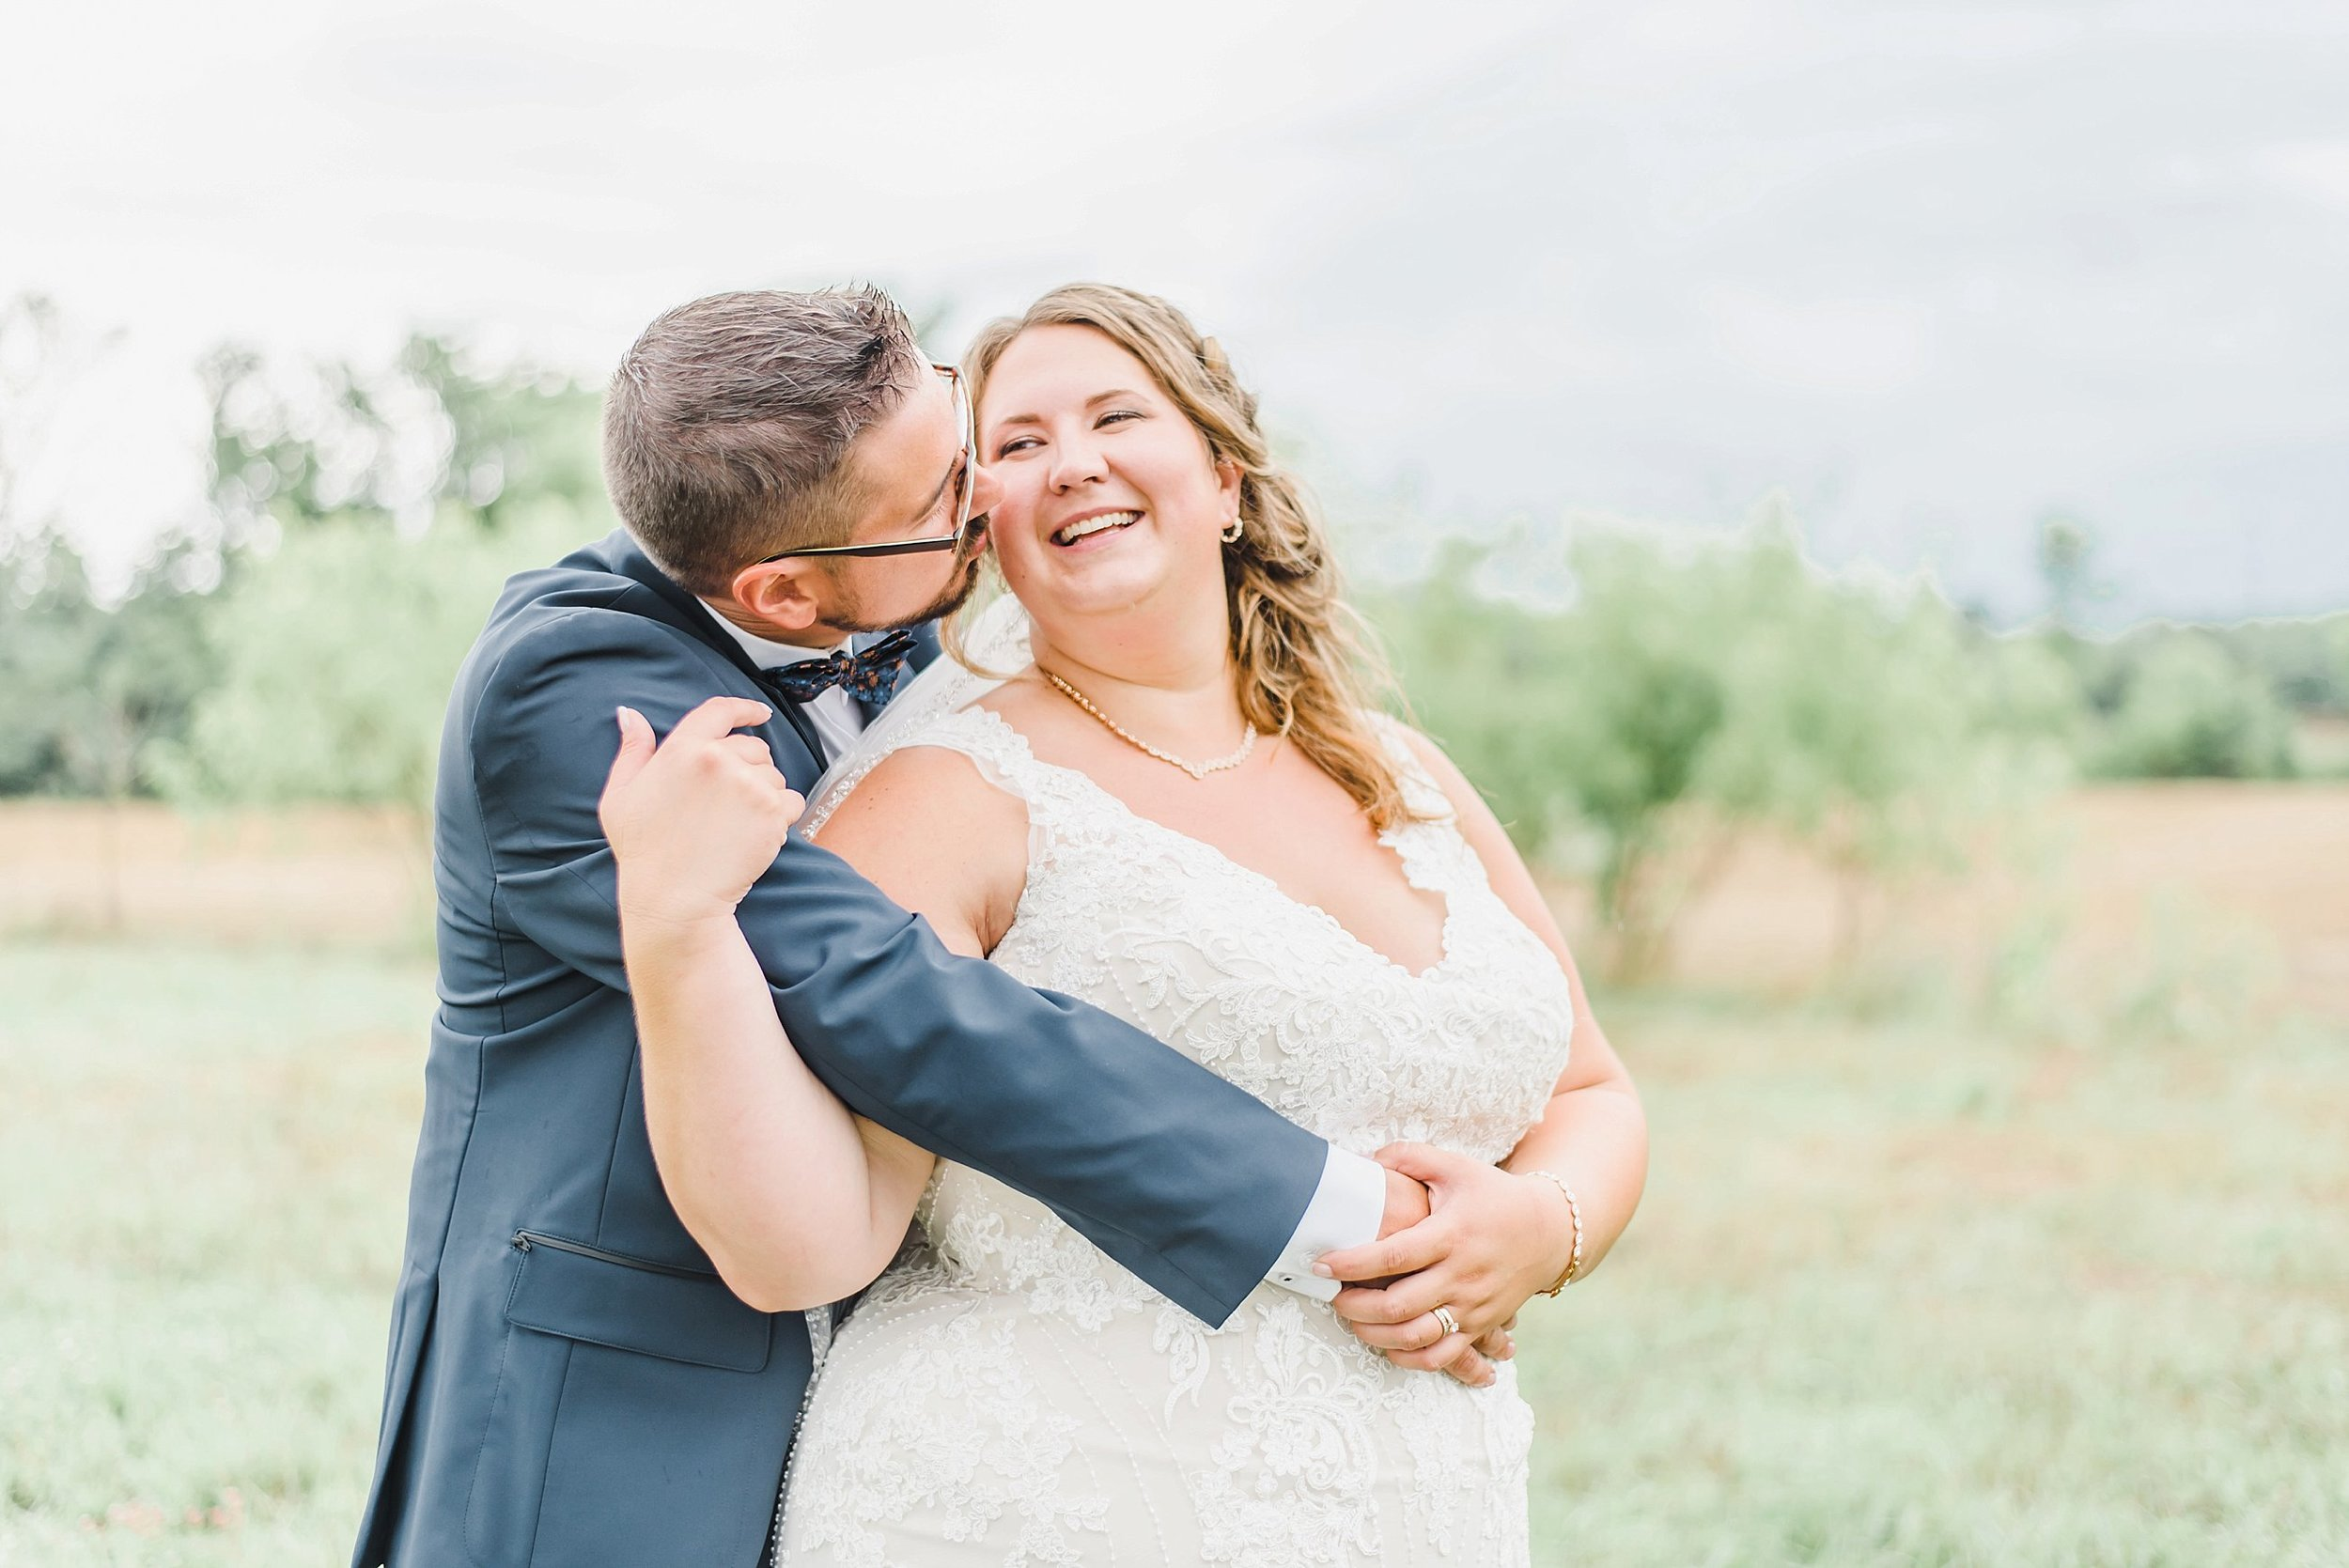 light airy indie fine art ottawa wedding photographer | Ali and Batoul Photography_0417.jpg